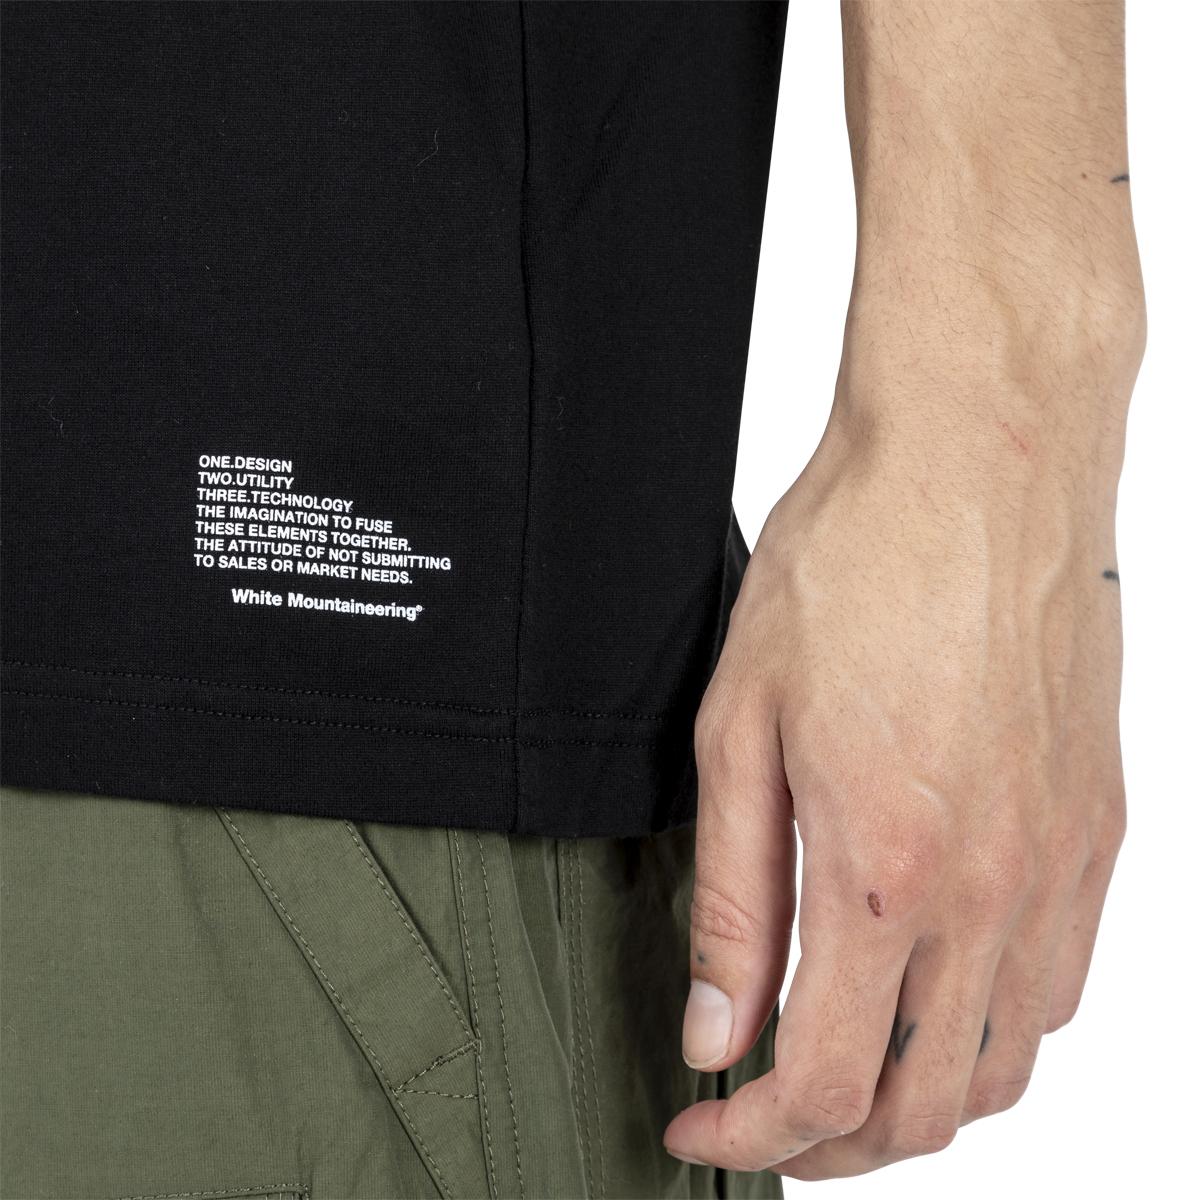 White Mountaineering Pocket Printed T-Shirt